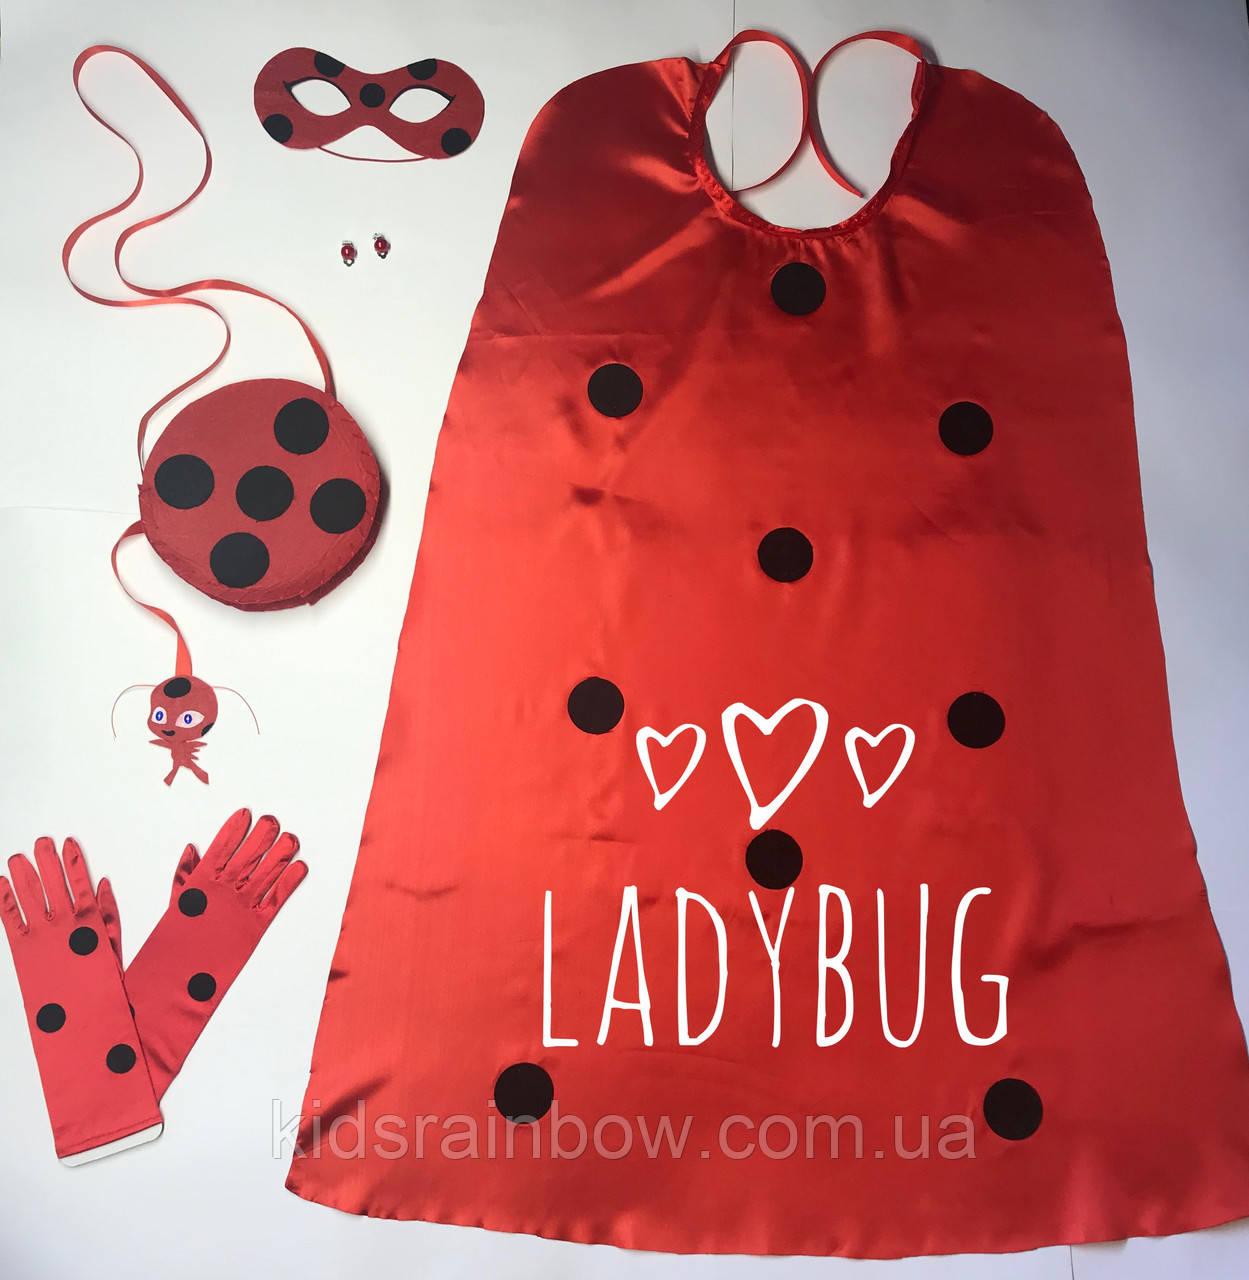 Леди Баг набор: маска сережки перчатки сумочка квами плащ